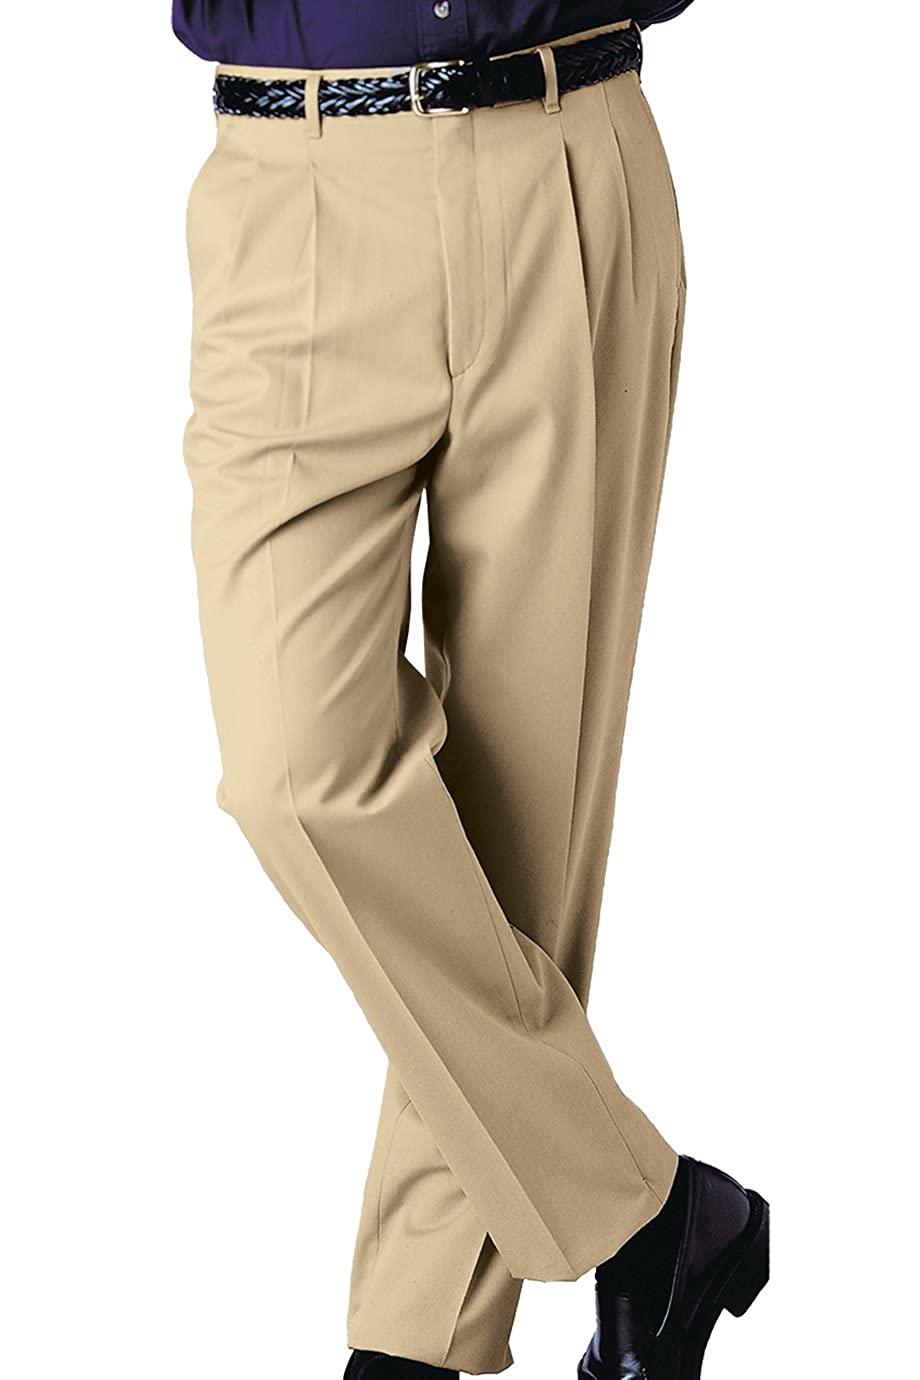 Edwards Mens Business Casual Pleated Chino Pant Khaki